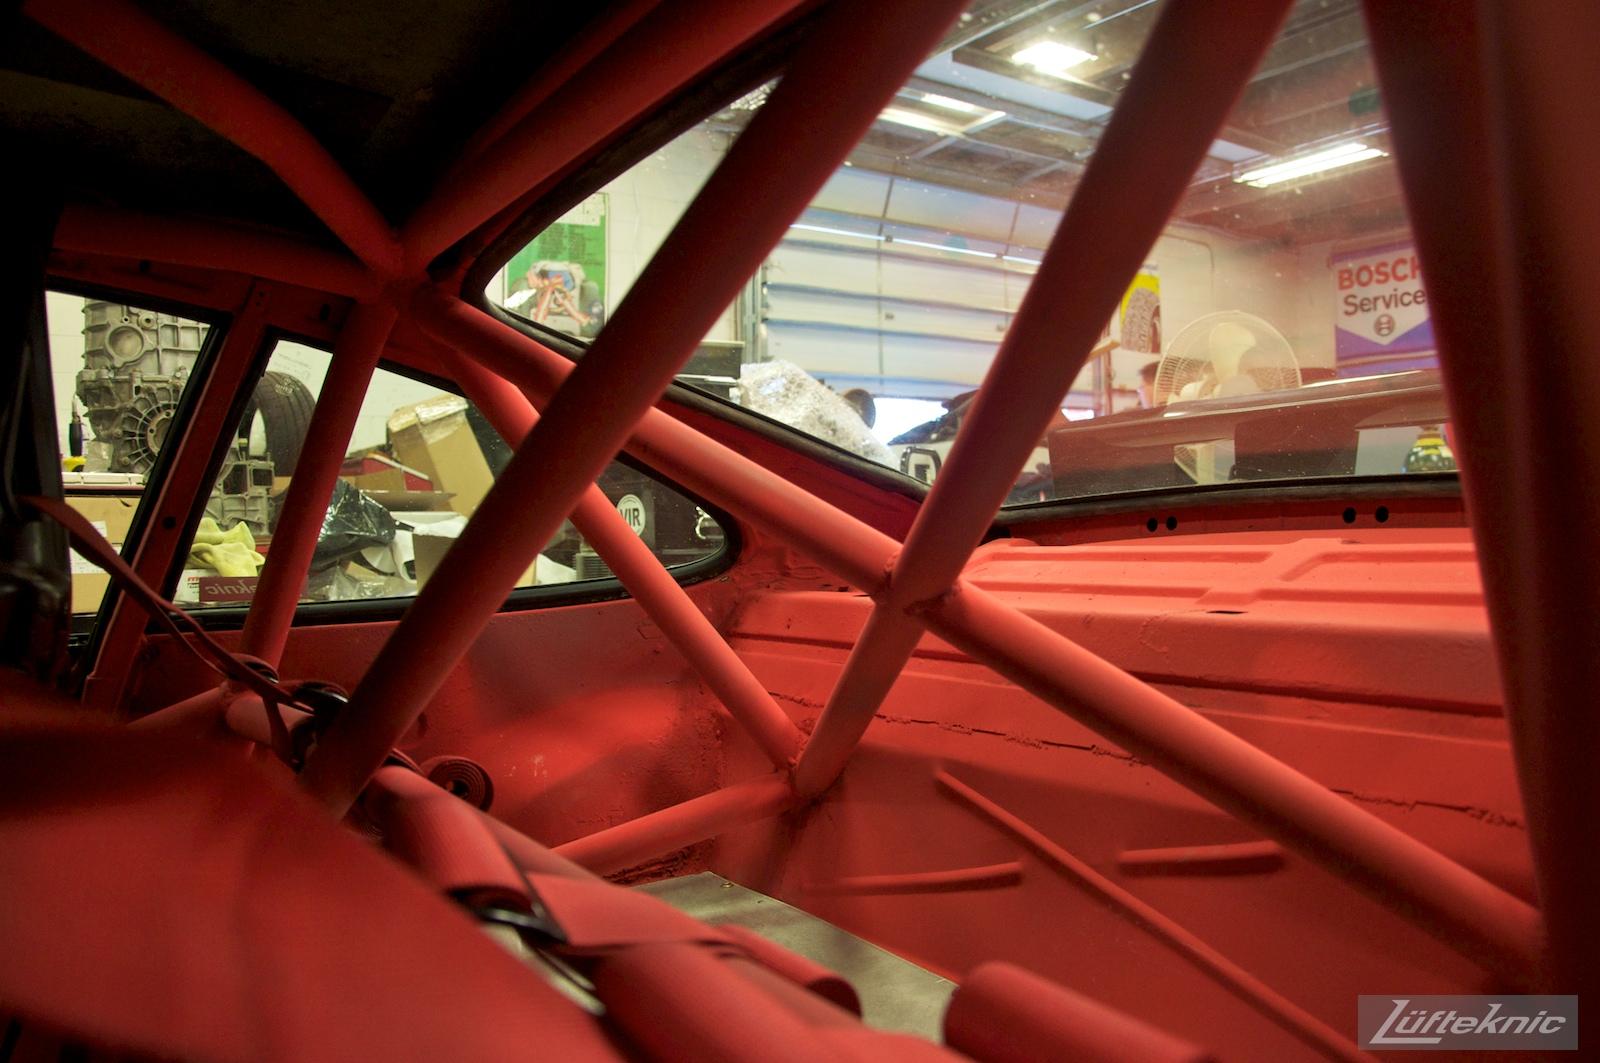 Roll cage details on the Lüfteknic #projectstuka Porsche 930 Turbo